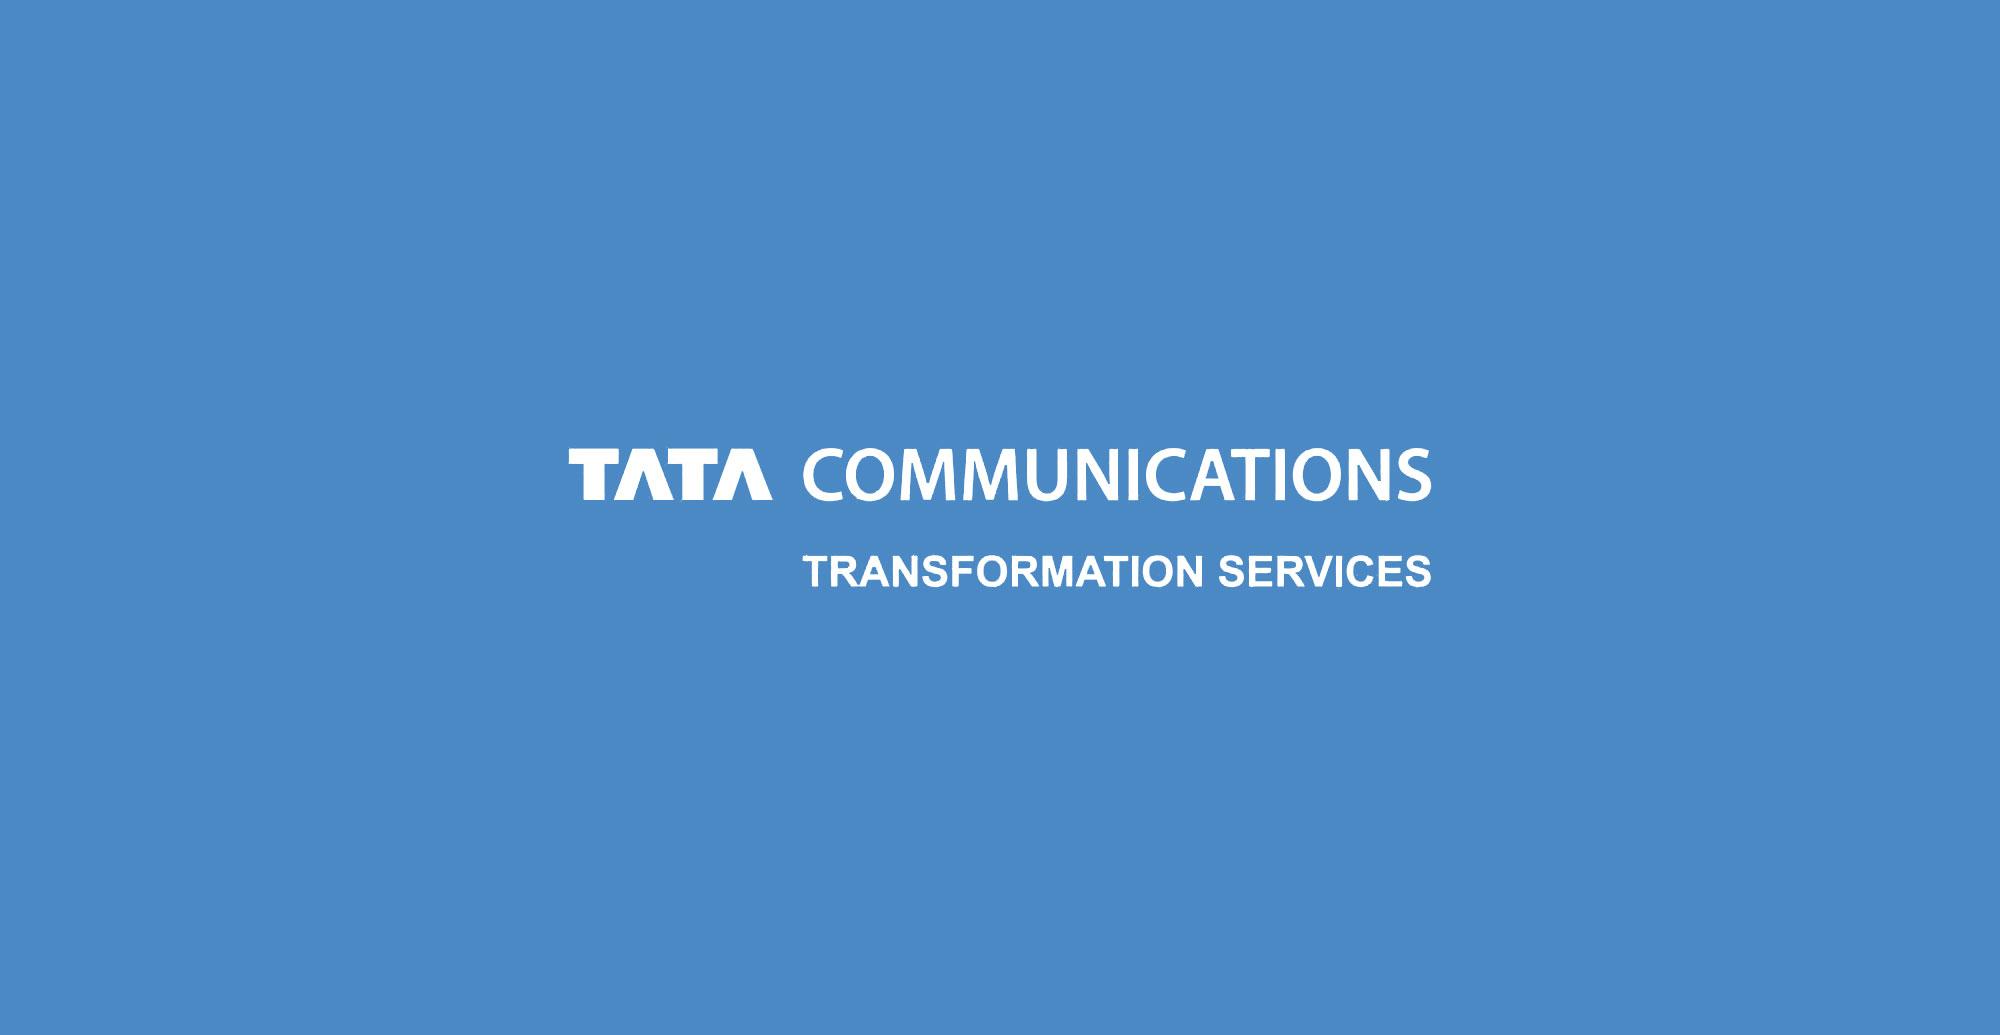 TATA communicationns launches new platform SCDX